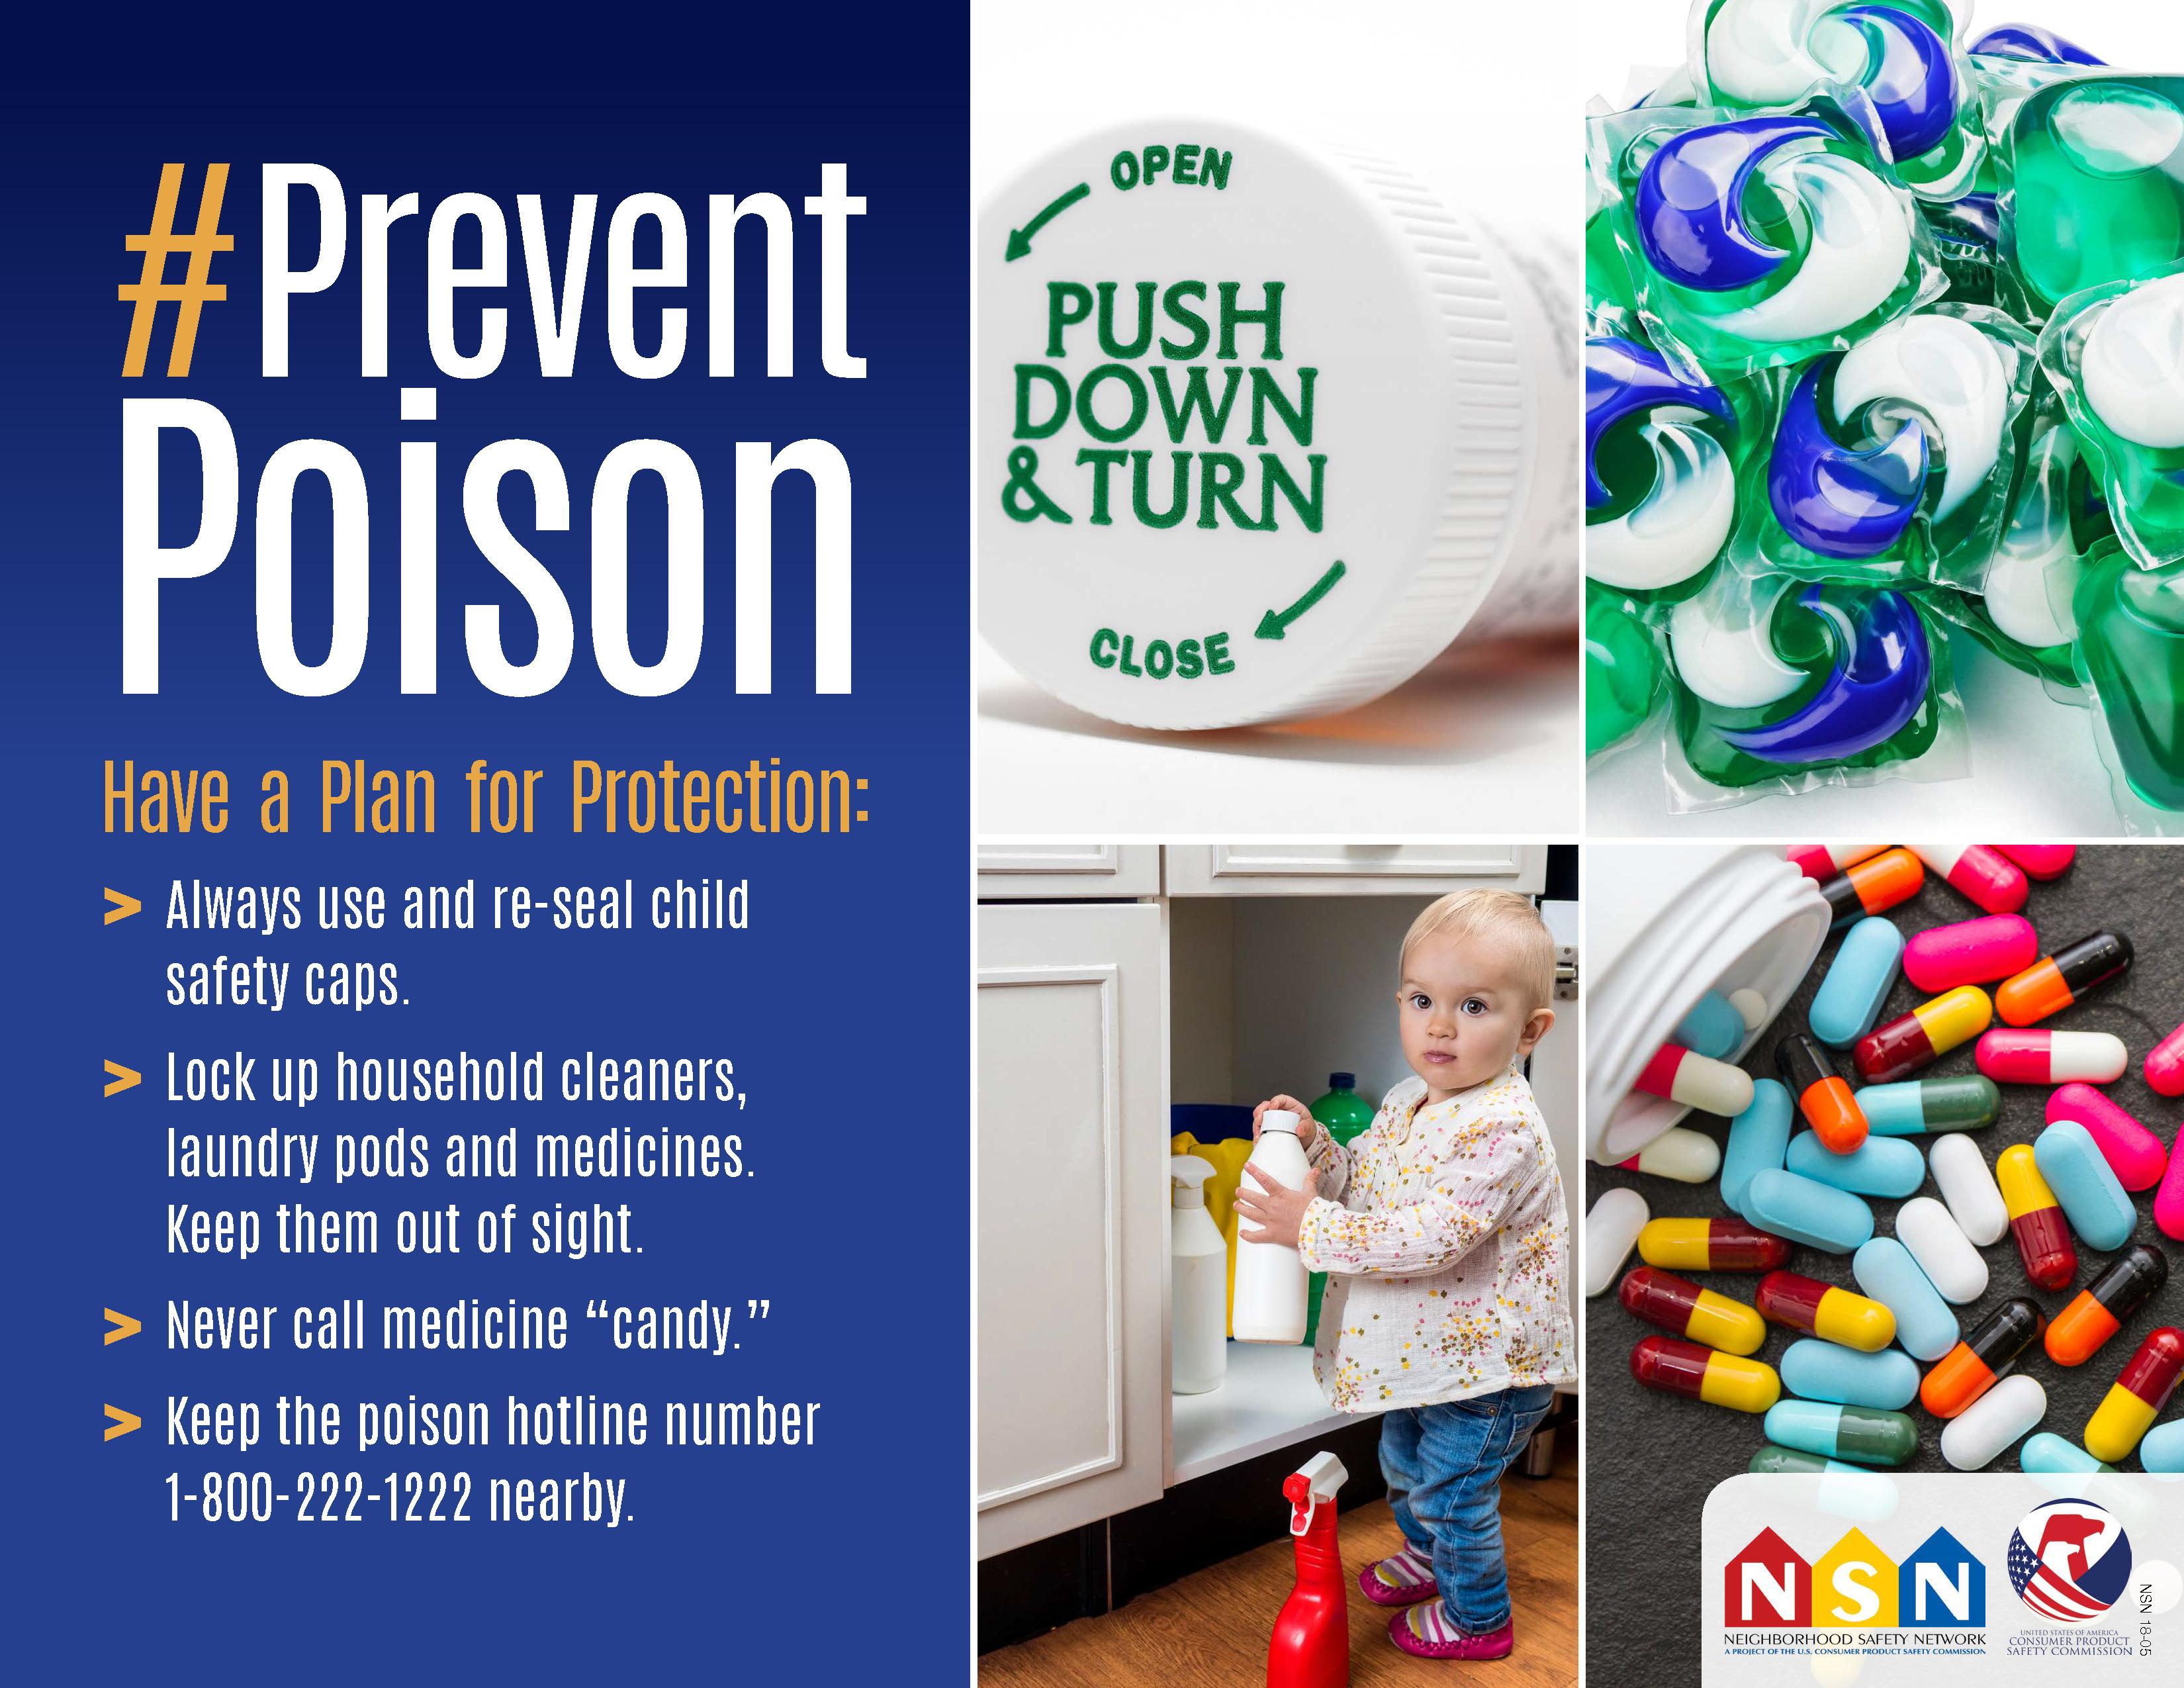 Watch Poison Prevention video